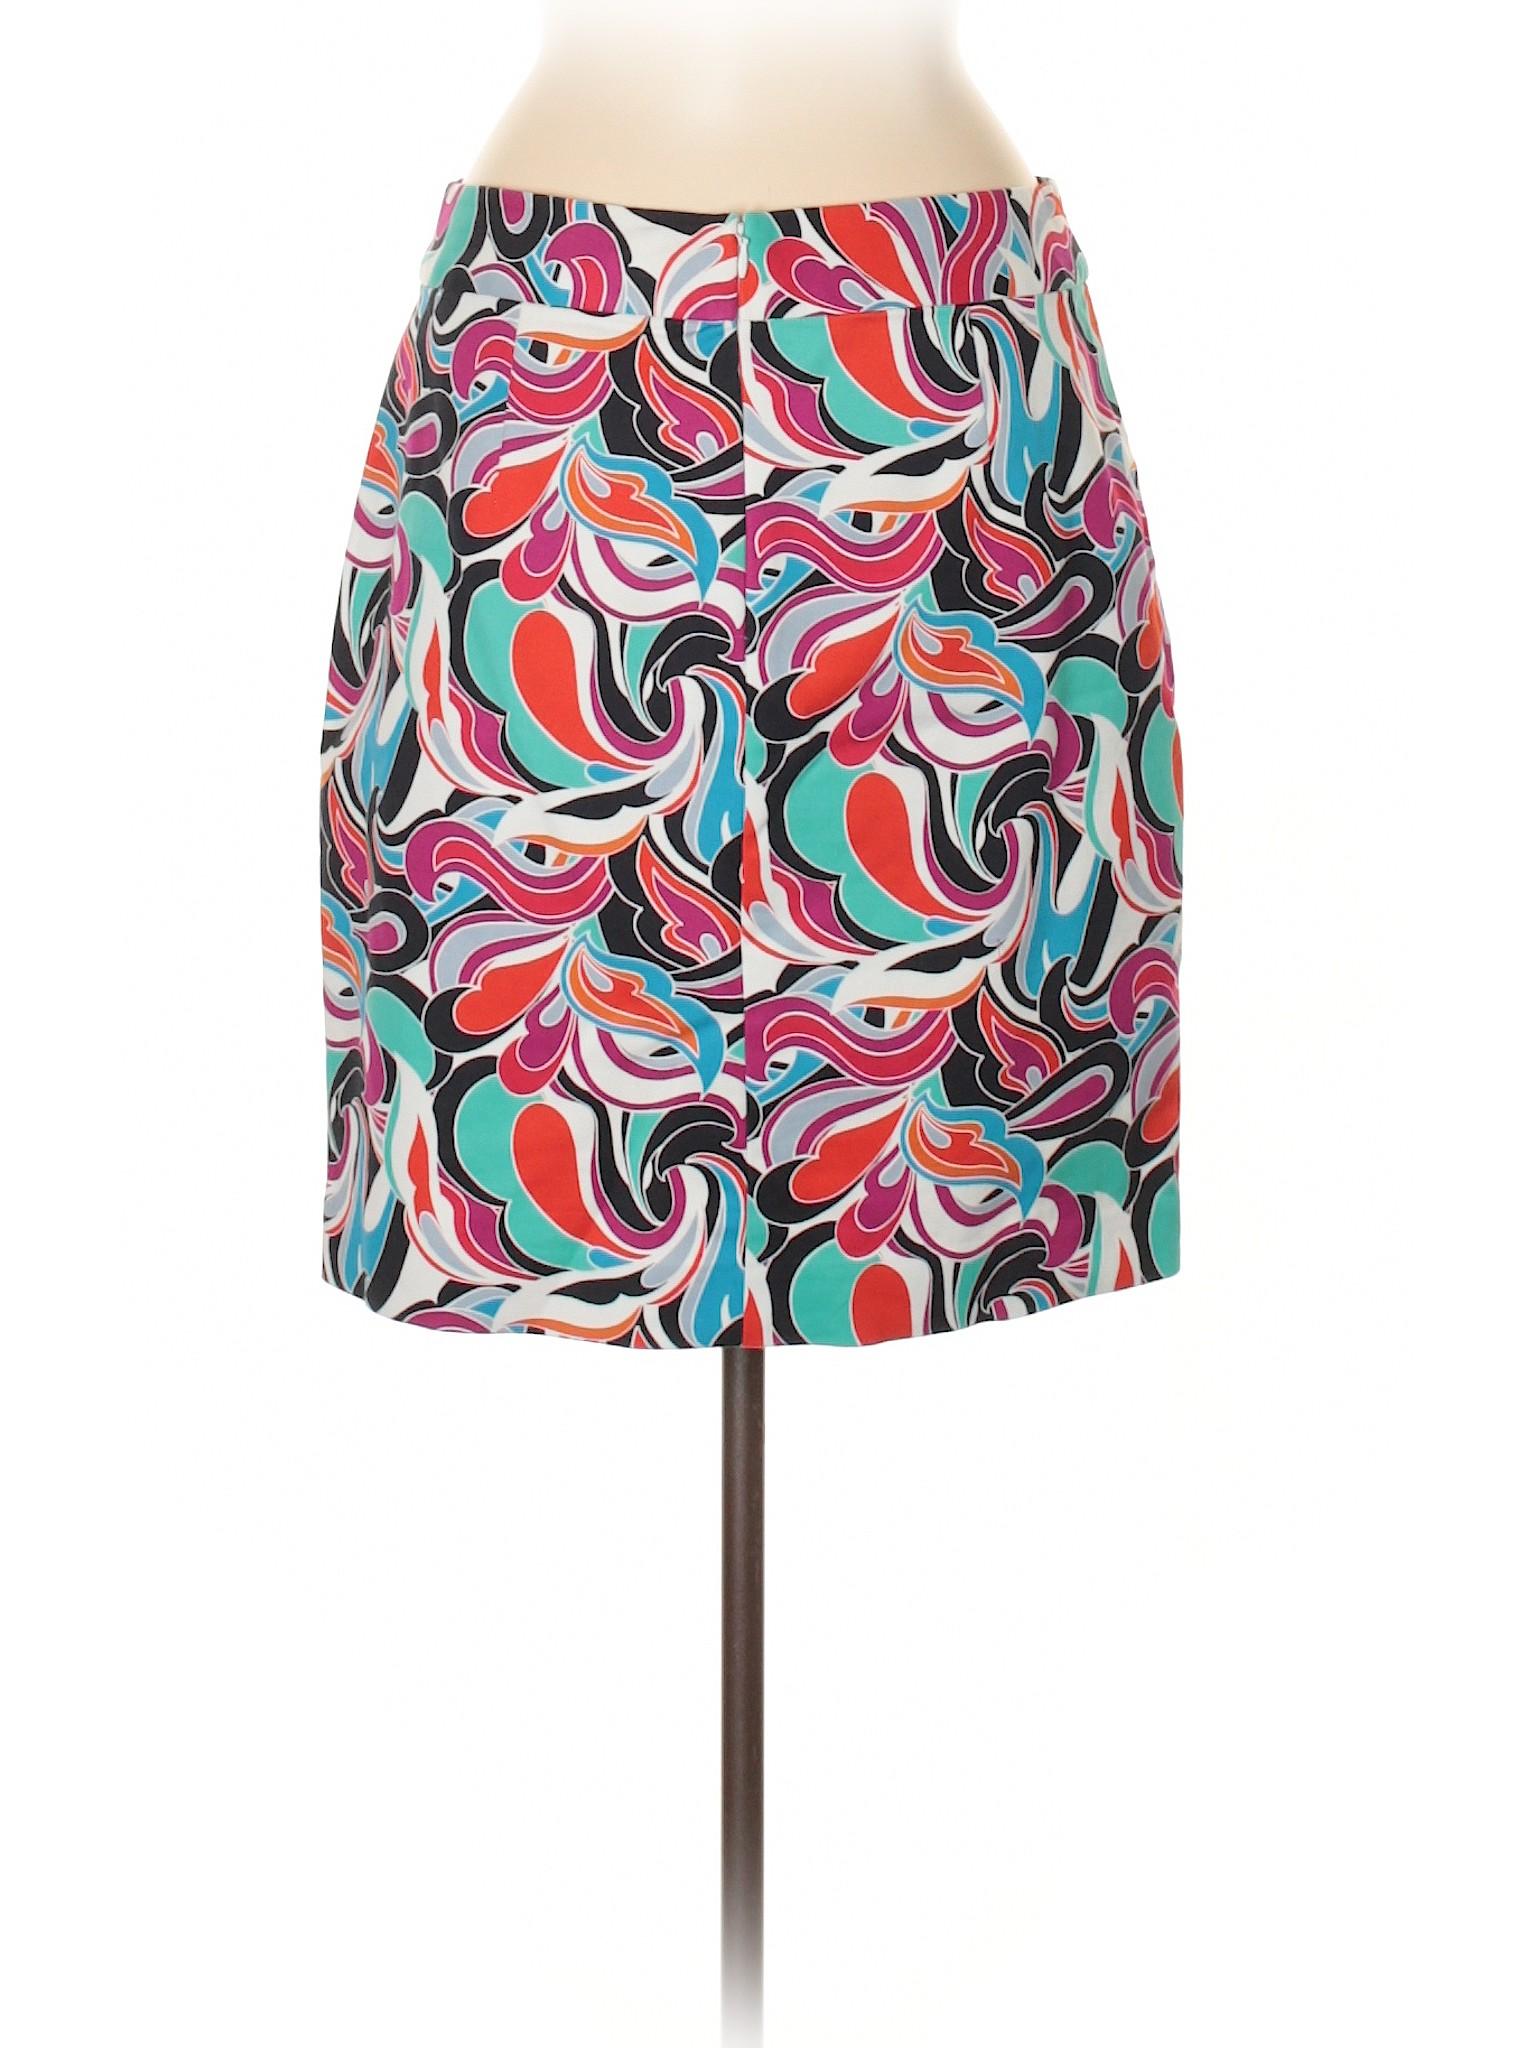 Boutique Skirt Casual Boutique Boutique Skirt Boutique Casual Casual Boutique Skirt Skirt Skirt Casual Casual ffA0B